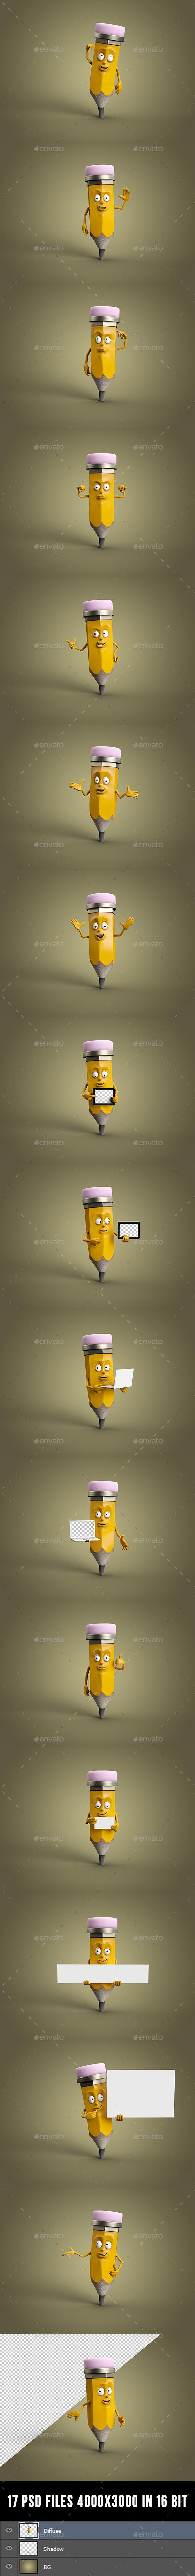 Drawy - Characters 3D Renders